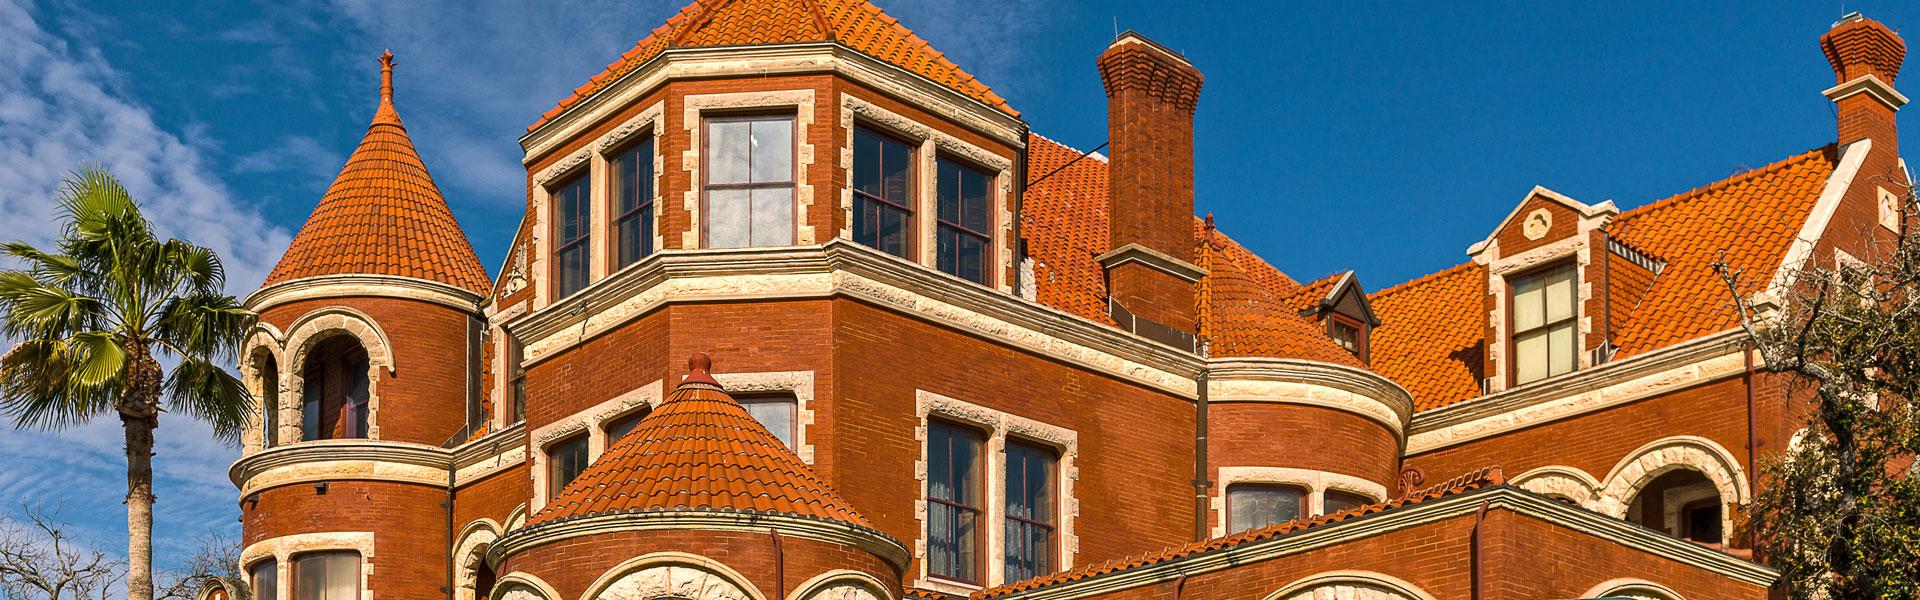 Exterior View of 1895 Moody Mansion, Galveston, TX